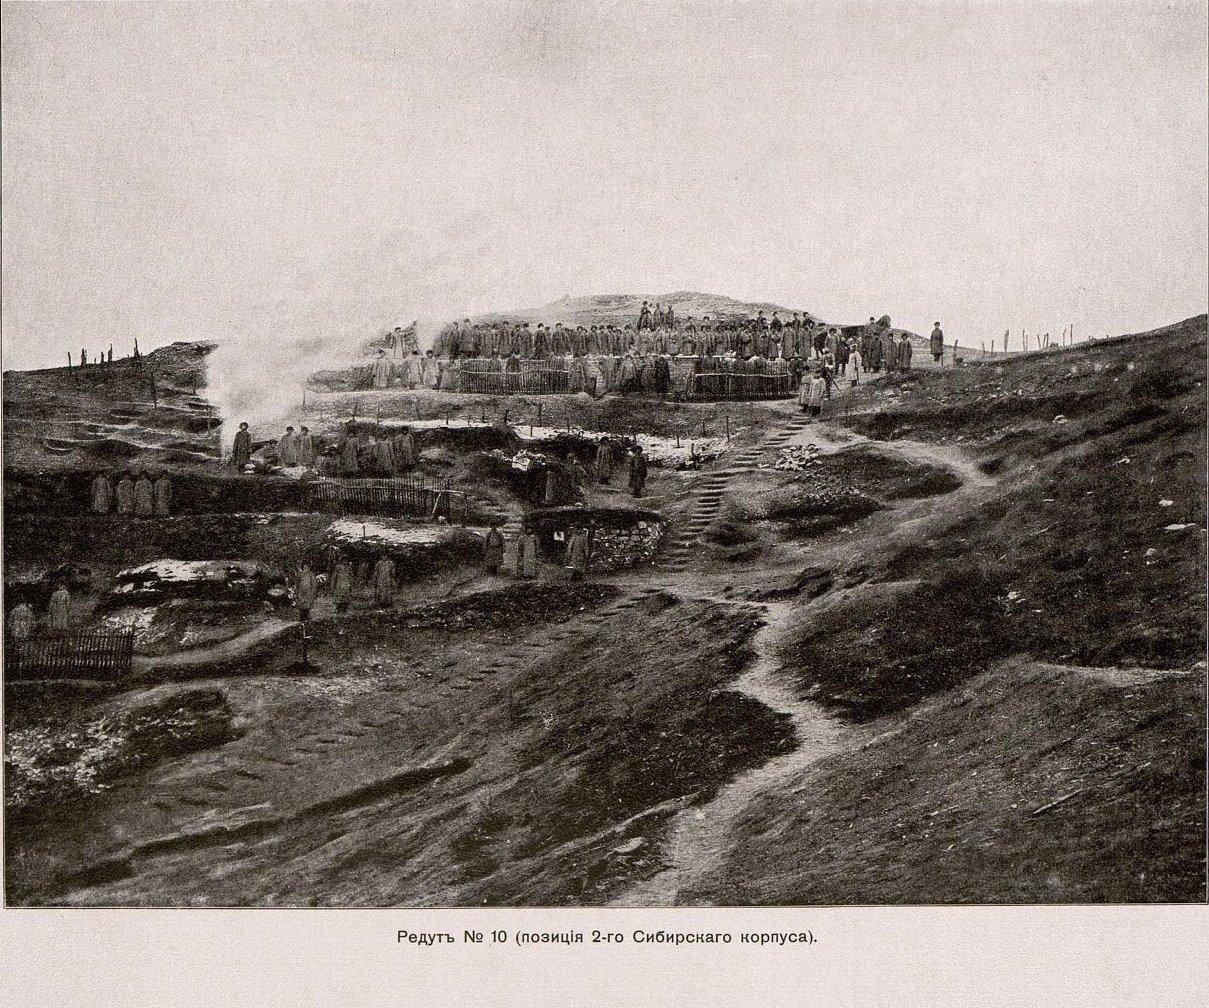 Редут №10 (позиция 2-го Сибирского корпуса)